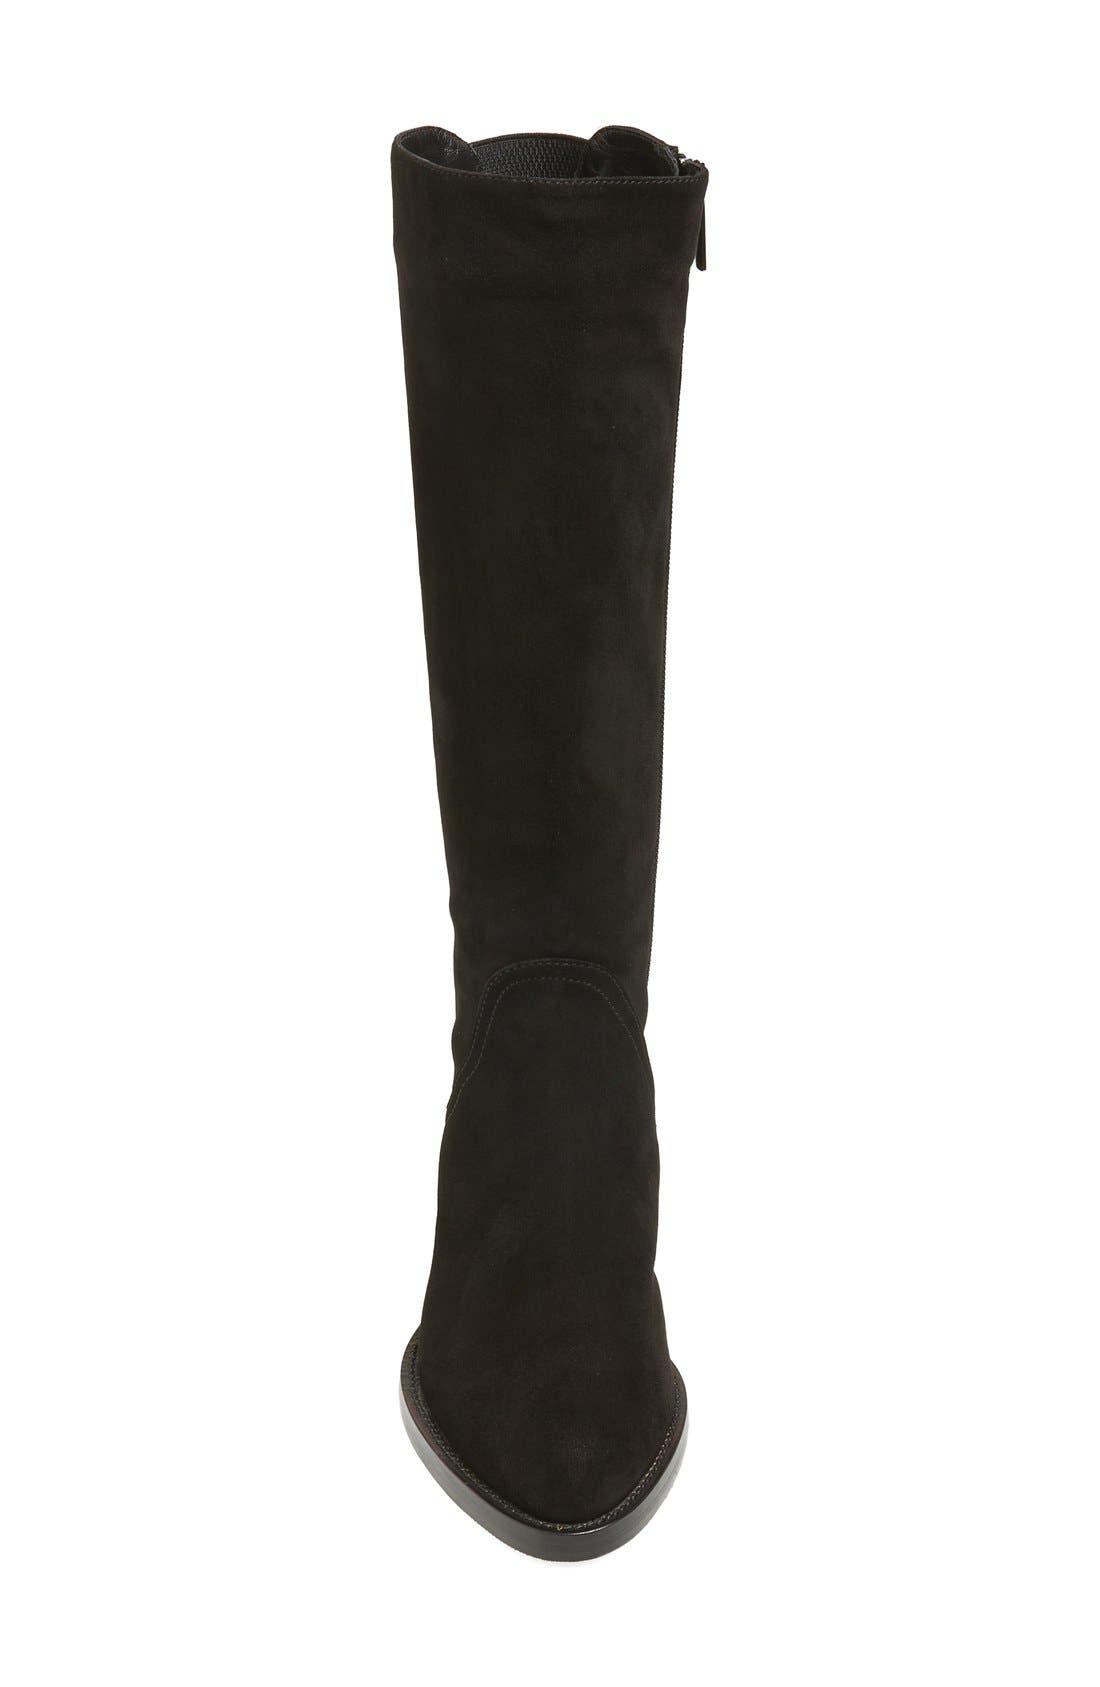 Alternate Image 3  - Aquatalia by Marvin K. 'Gutsy' Weatherproof Tall Boot (Women)